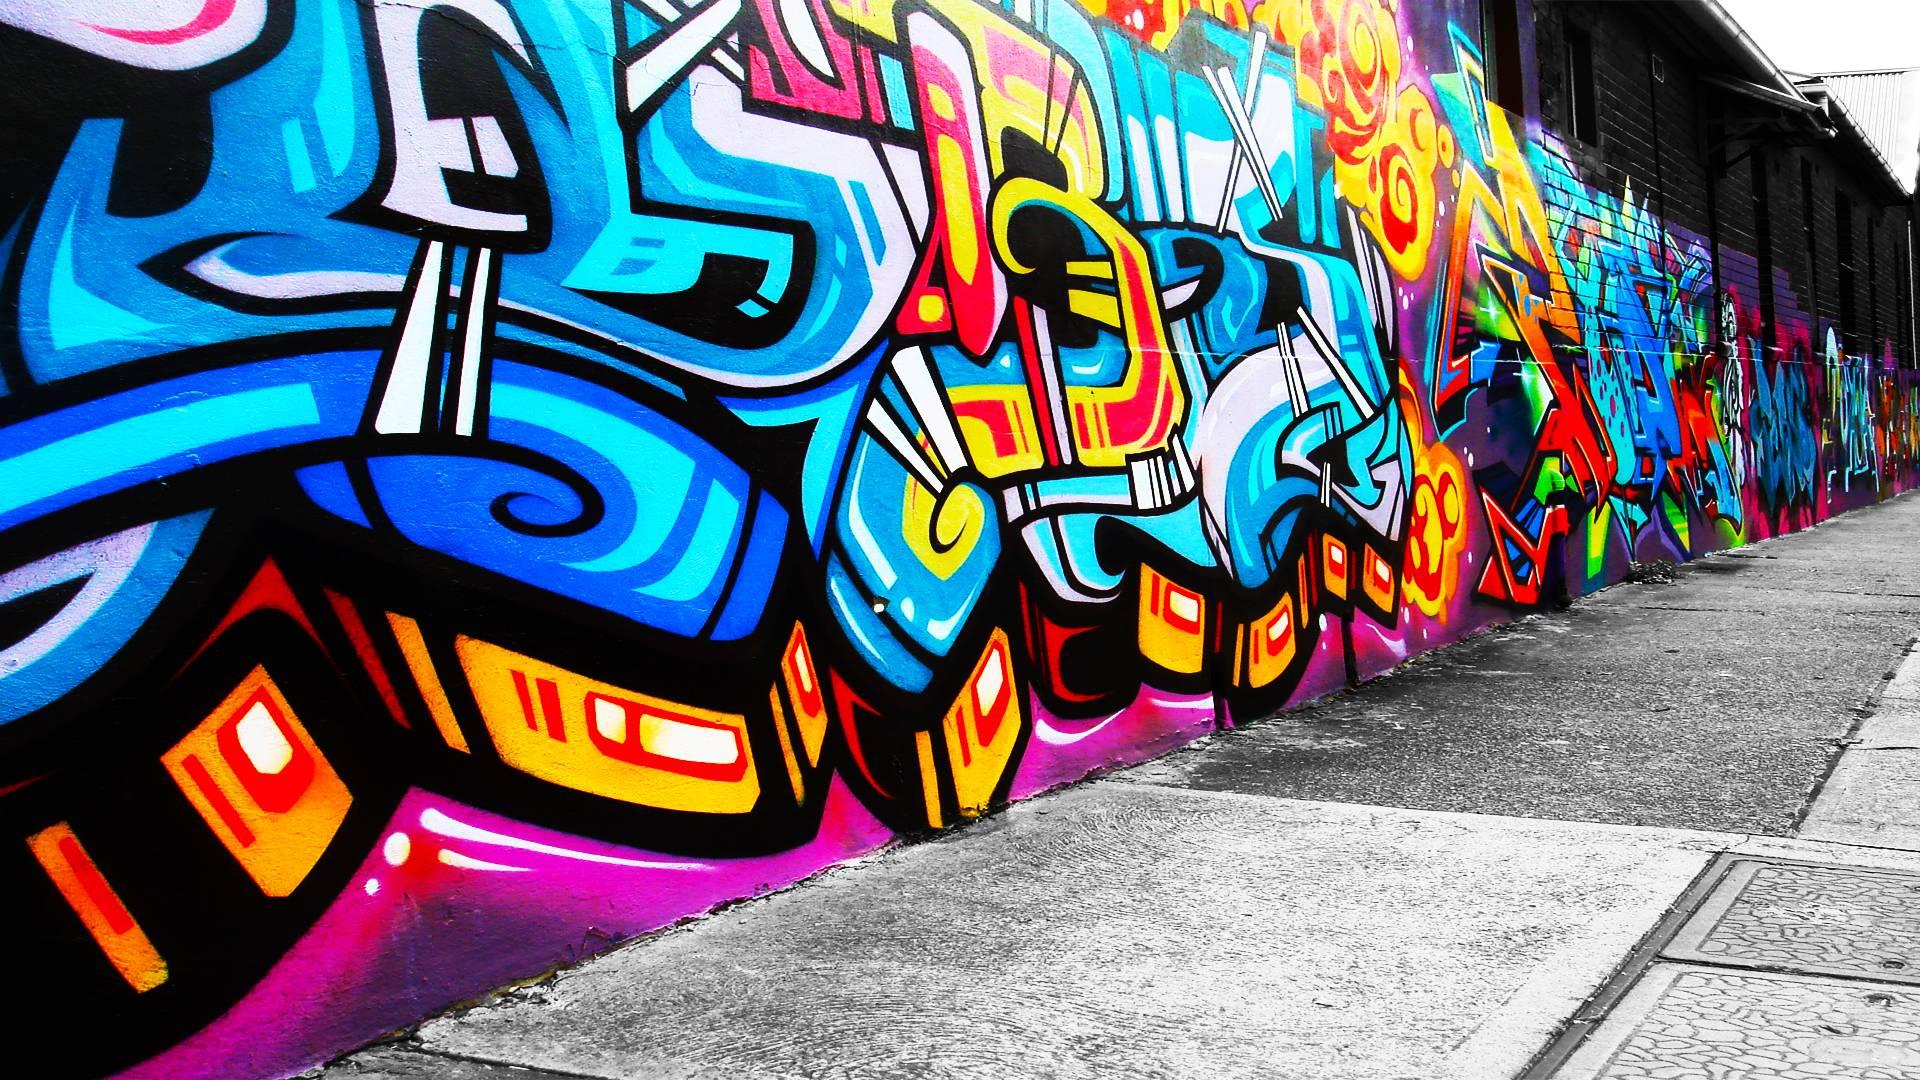 Graffiti Wallpapers Desktop 3D - Wallpaper Cave